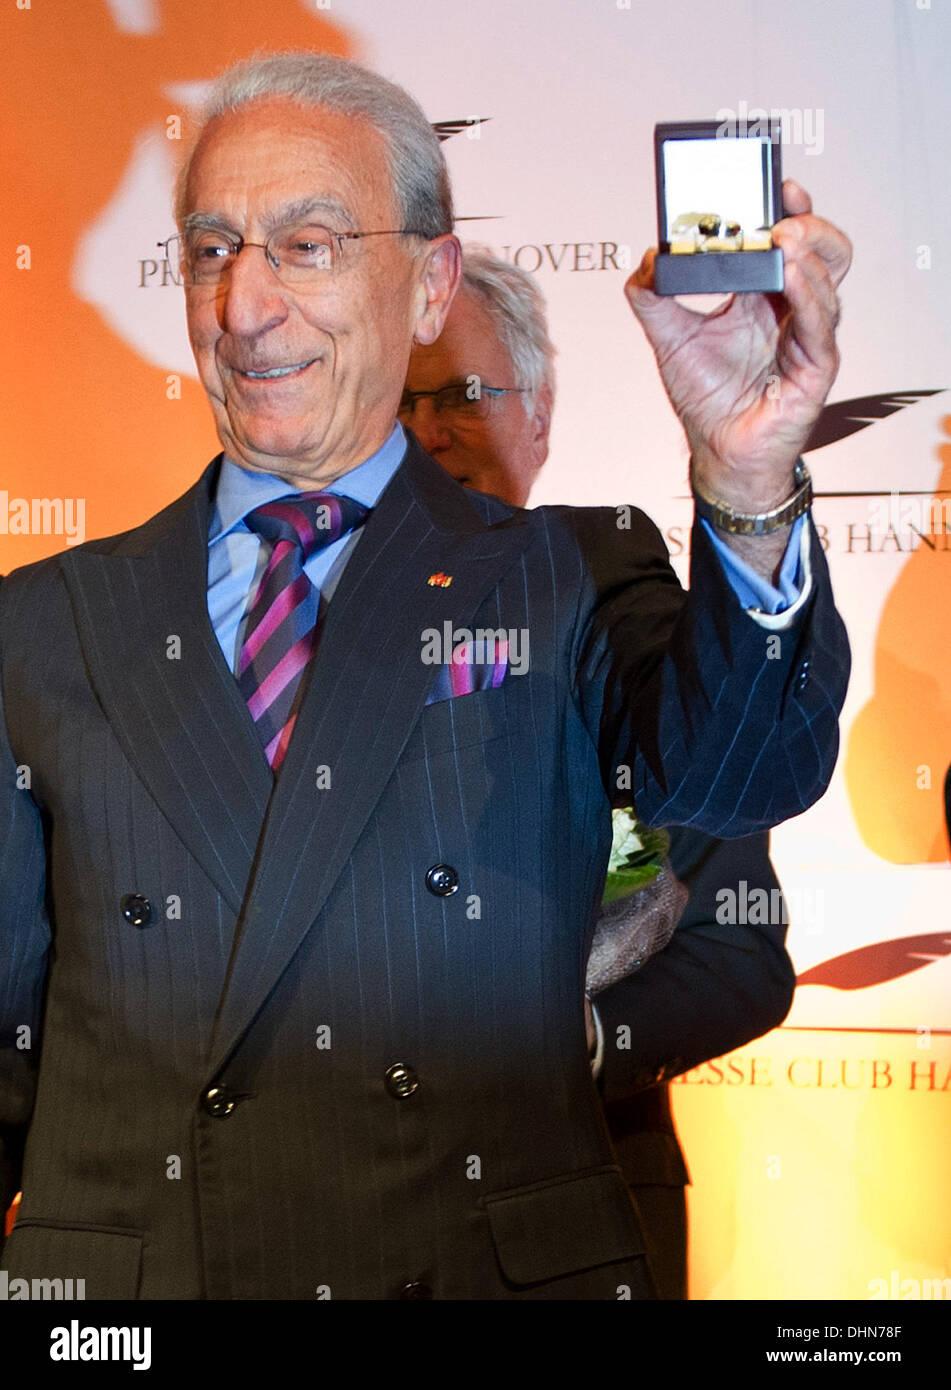 Hanover, Germany. 12th Nov, 2013. Brain surgeon Madjid Samii presents the Leibniz-Ring 2013 award, issued by the Stock Photo